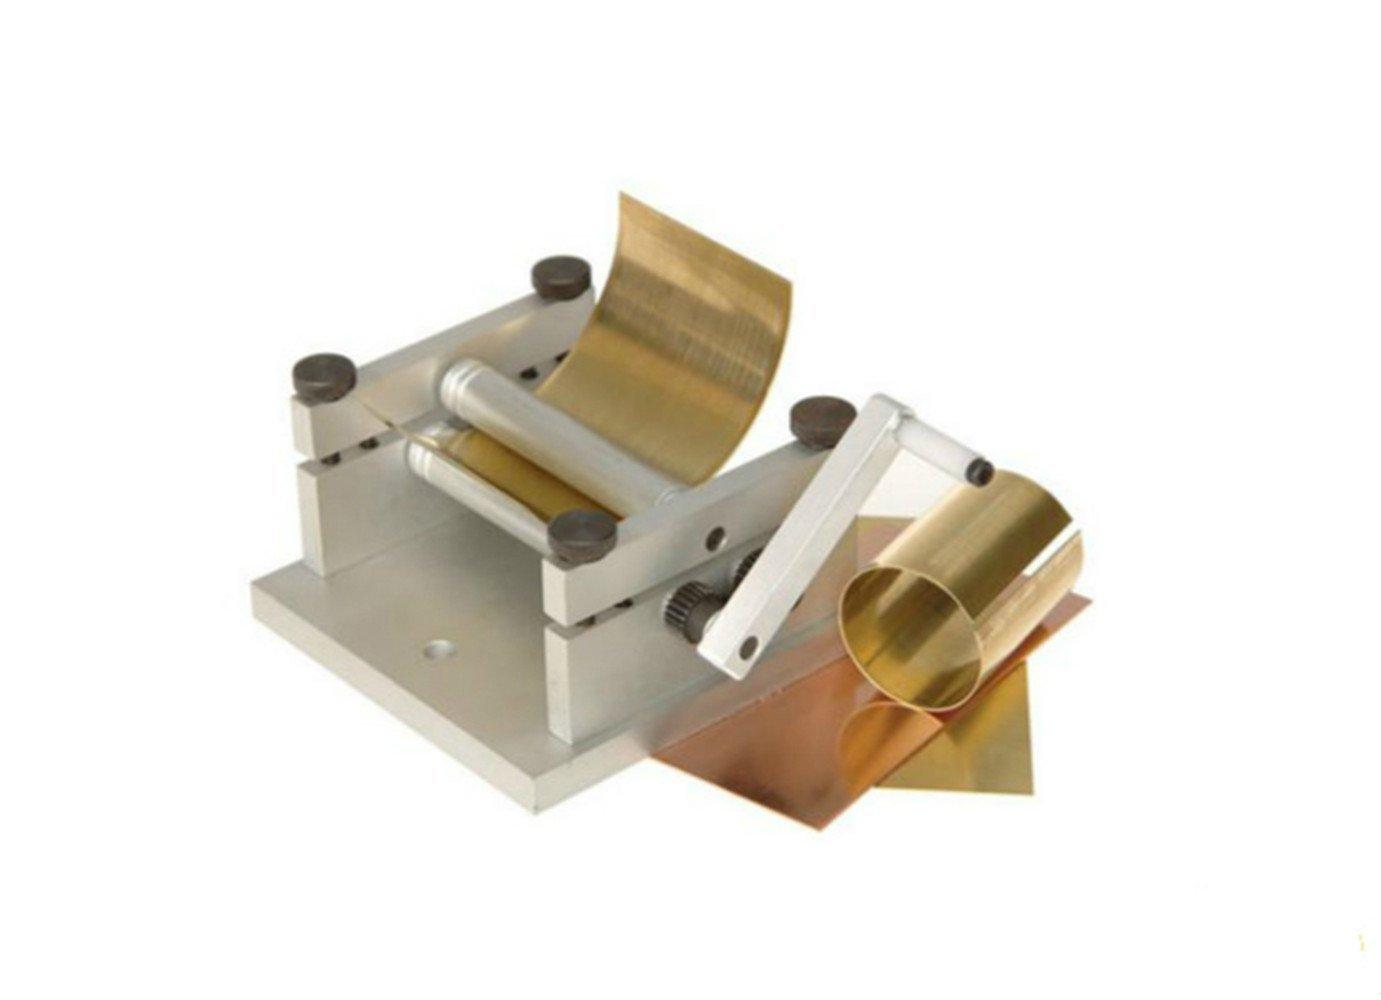 Metal Bending Machine >> Newtry New S N 20013 Bending Machine For Making Metal Model Mini